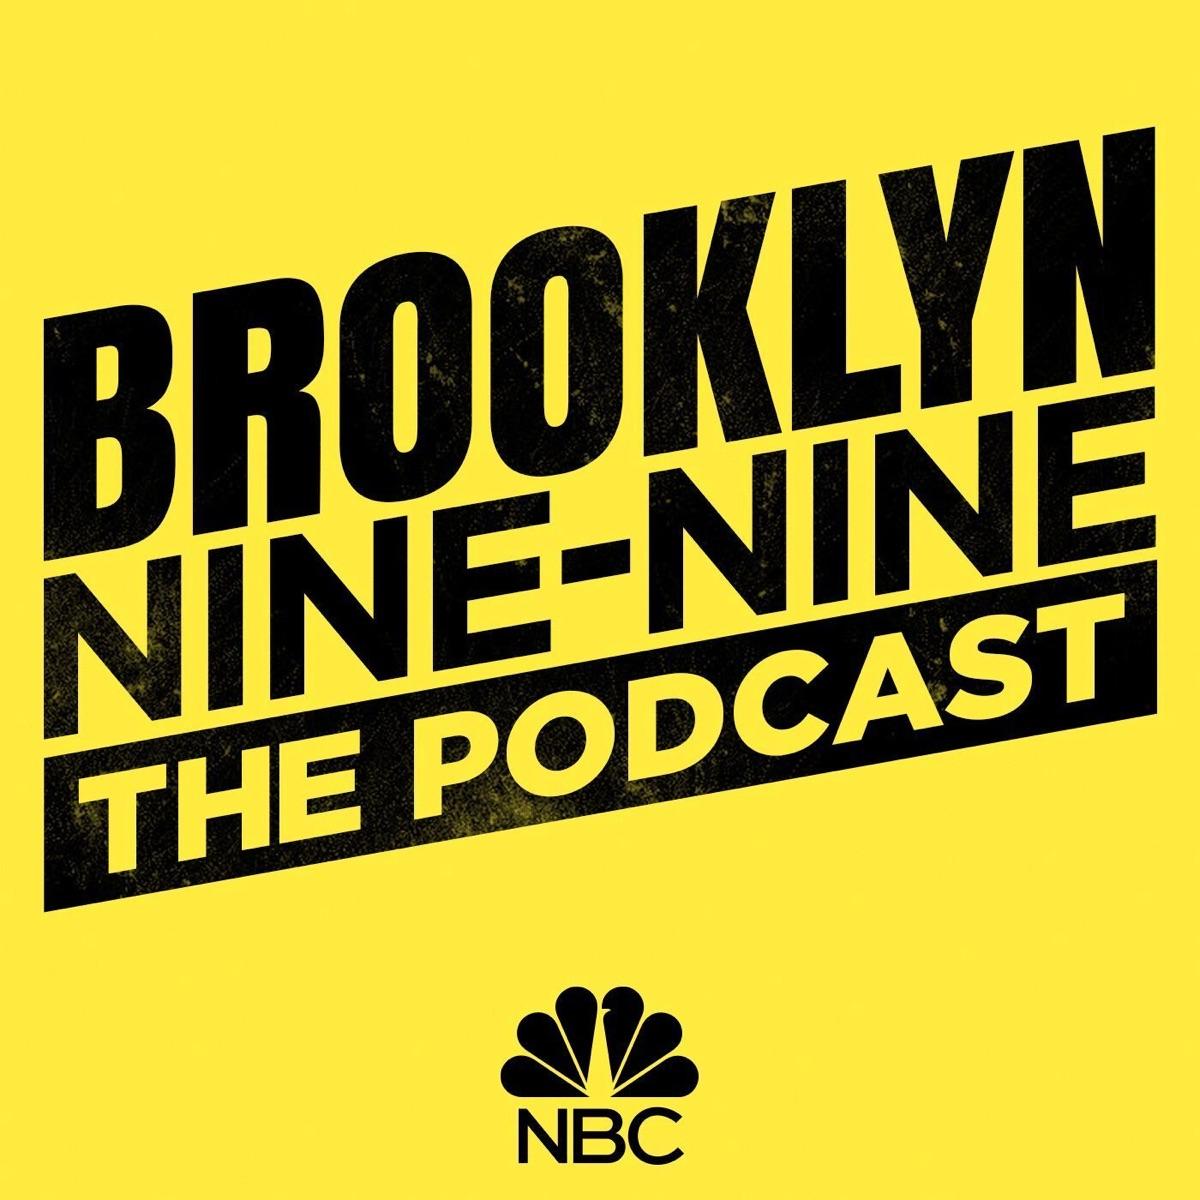 Brooklyn Nine-Nine: The Podcast